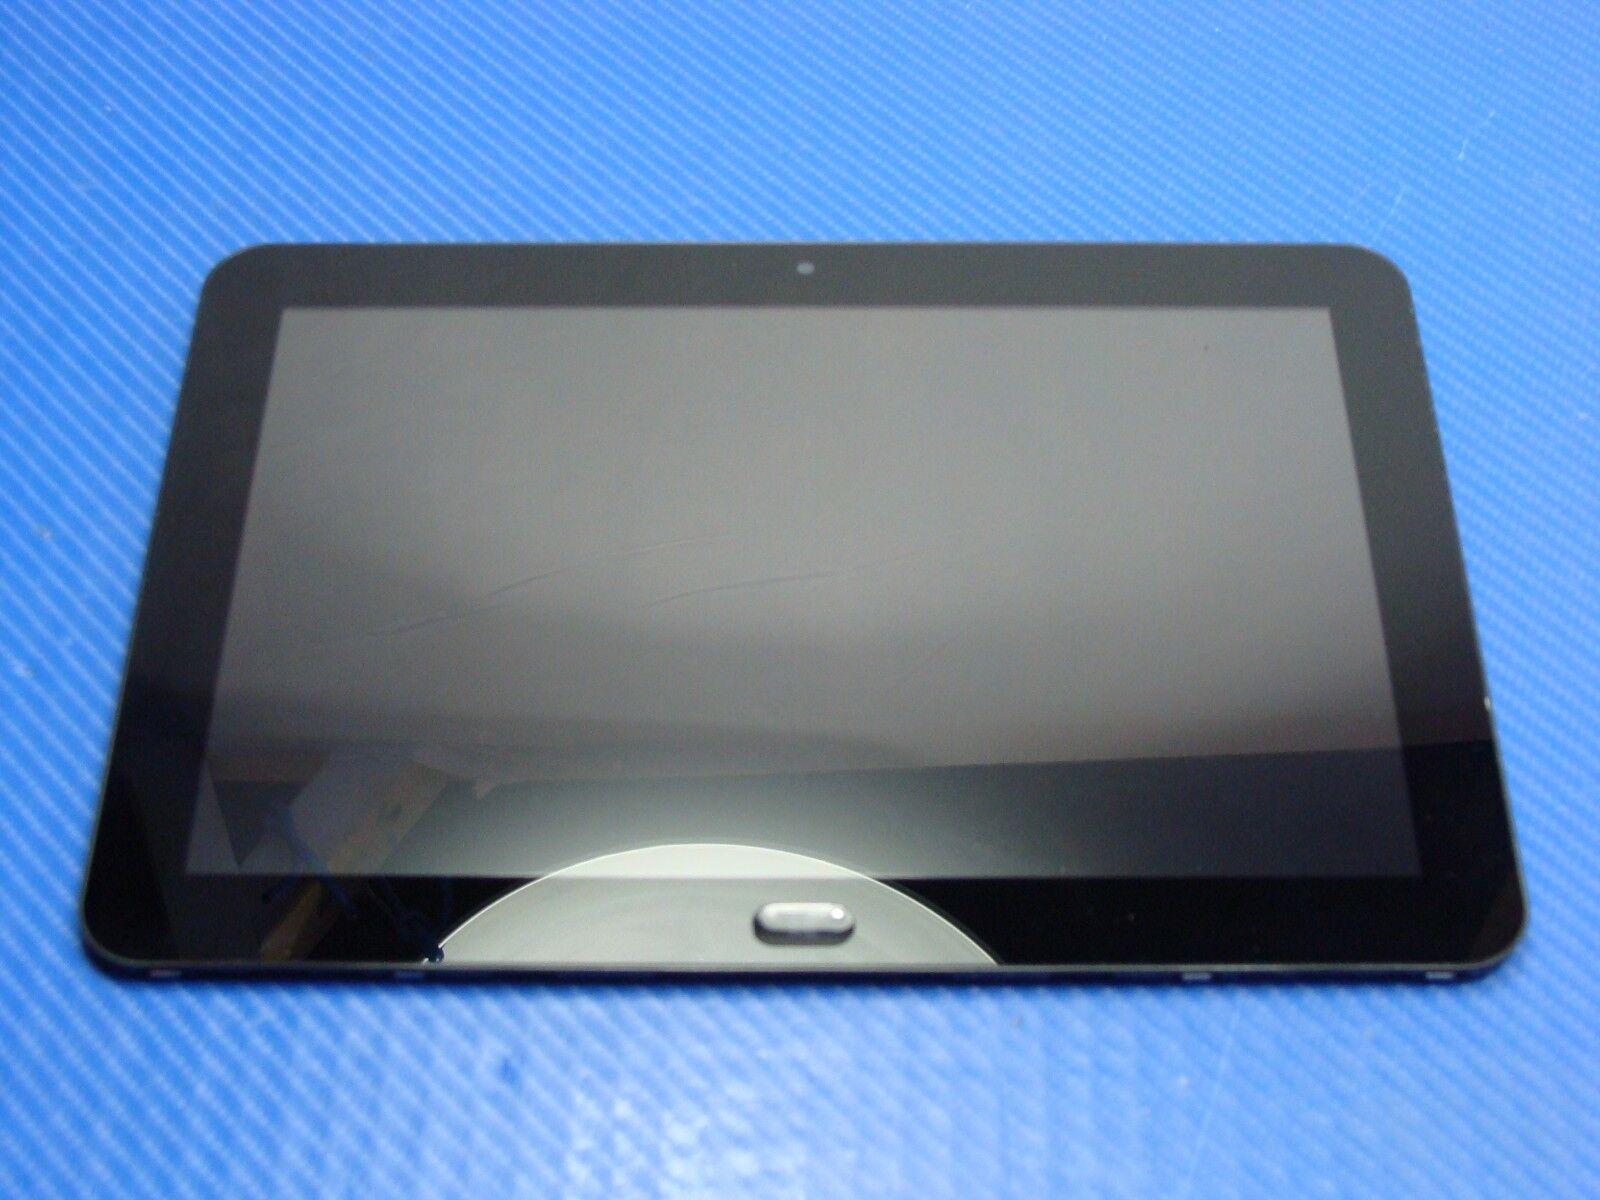 "HP ElitePad 10.1"" 900 Tablet Glossy Touchscreen LP101WX2 (SL)(P1) AS IS GLP*"